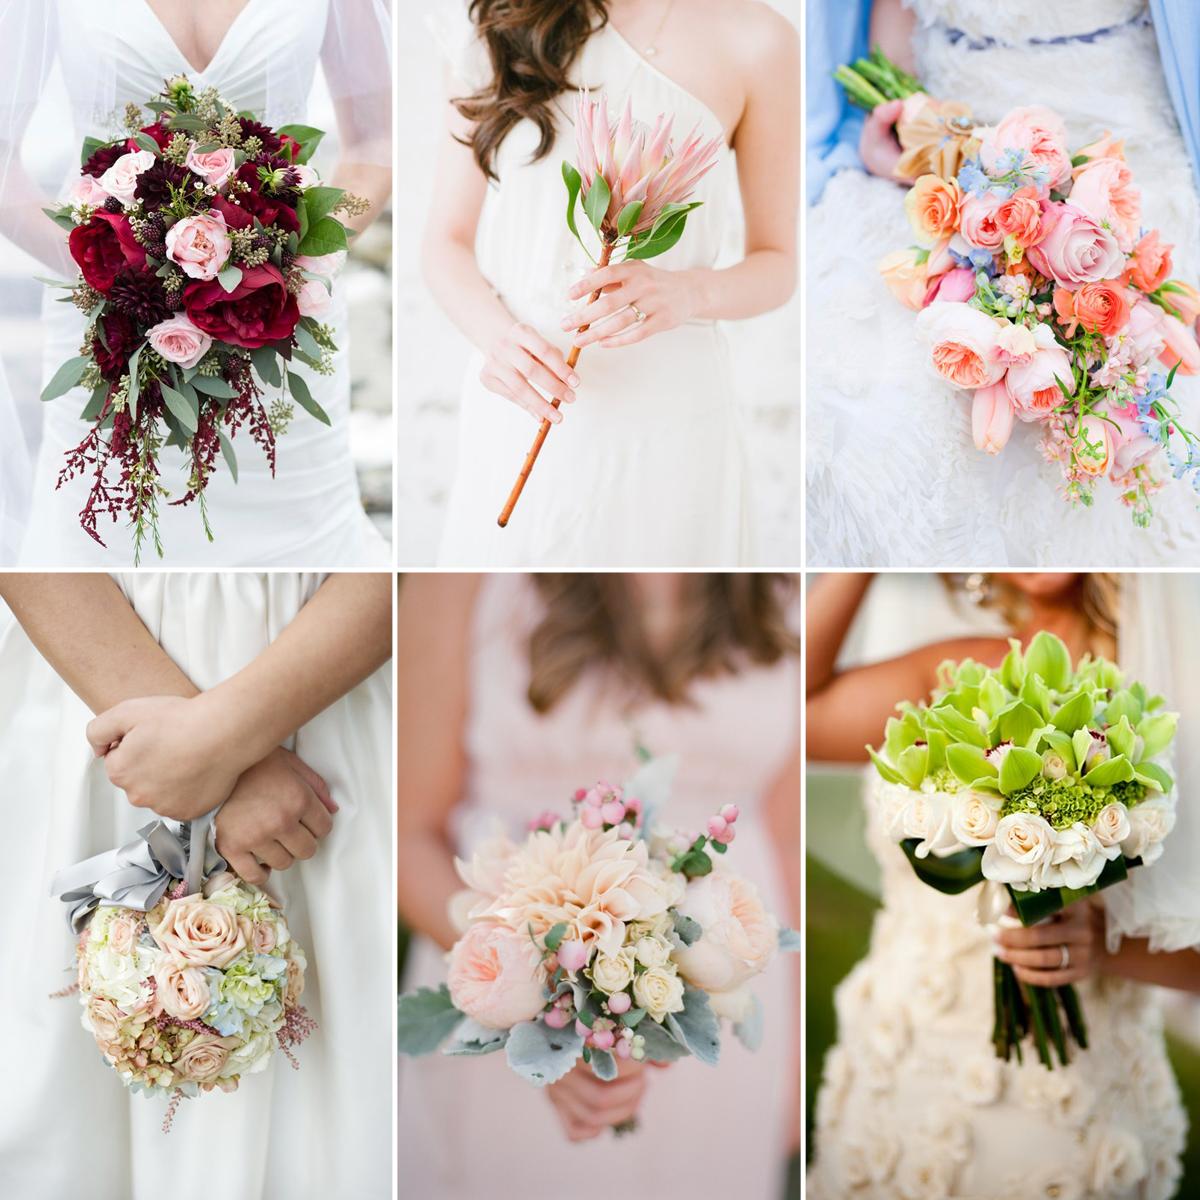 12 Types Of Wedding Bouquets Wedding Flower Types Cheap Wedding Bouquets Bridesmaid Flower Bouquet